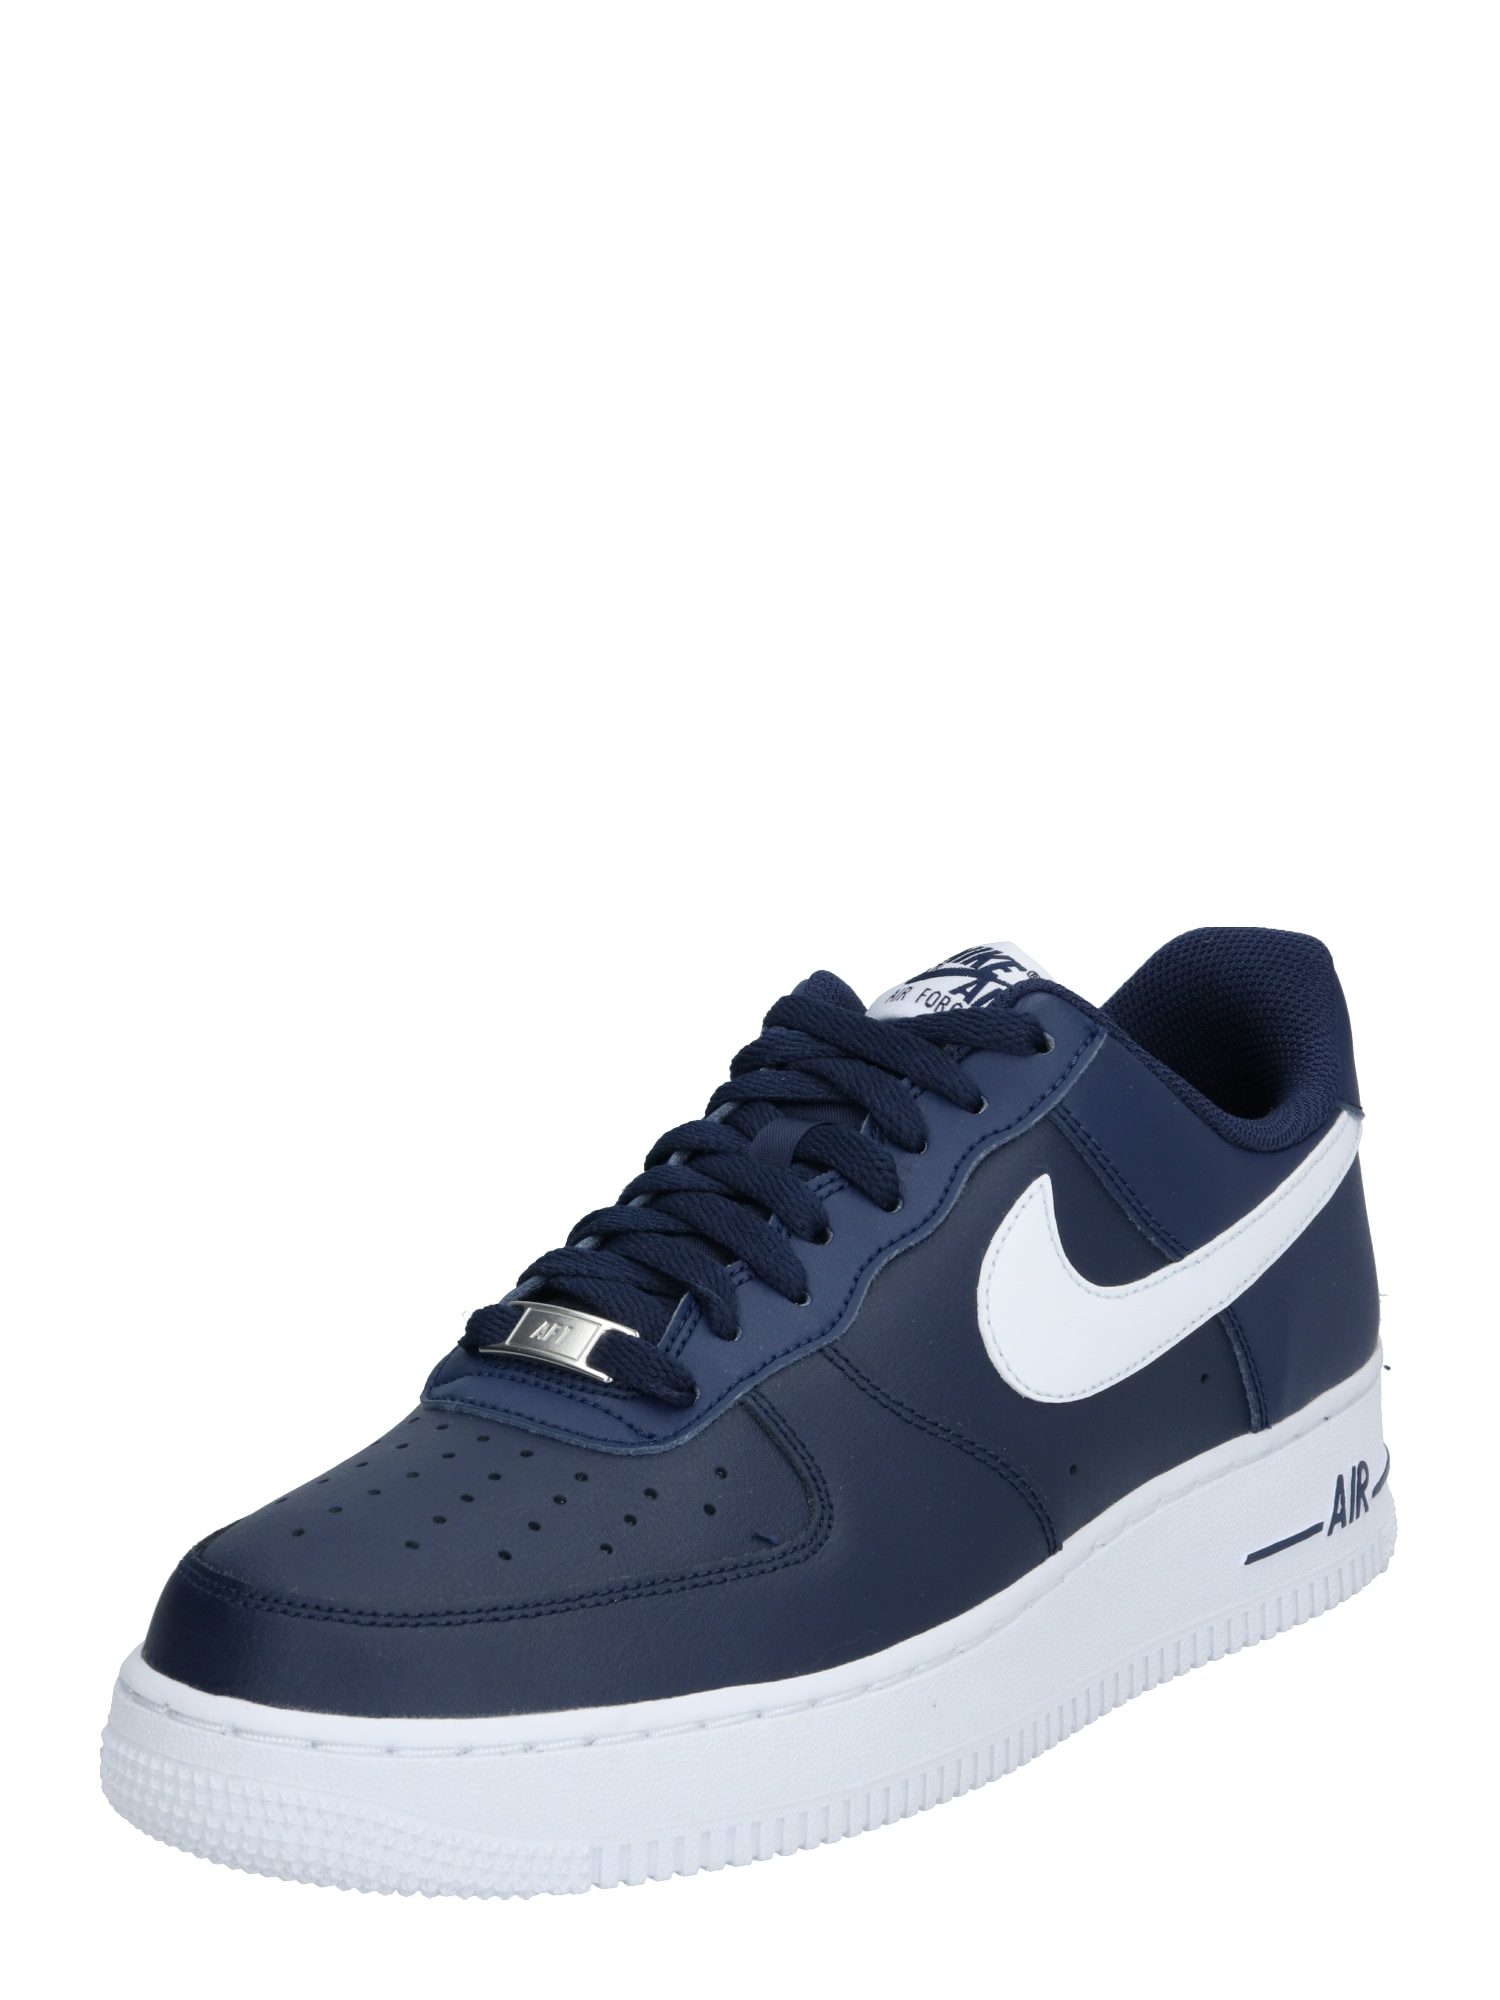 Nike Sportswear Nízke tenisky 'AIR FORCE 1 '07 AN20'  tmavomodrá / námornícka modrá